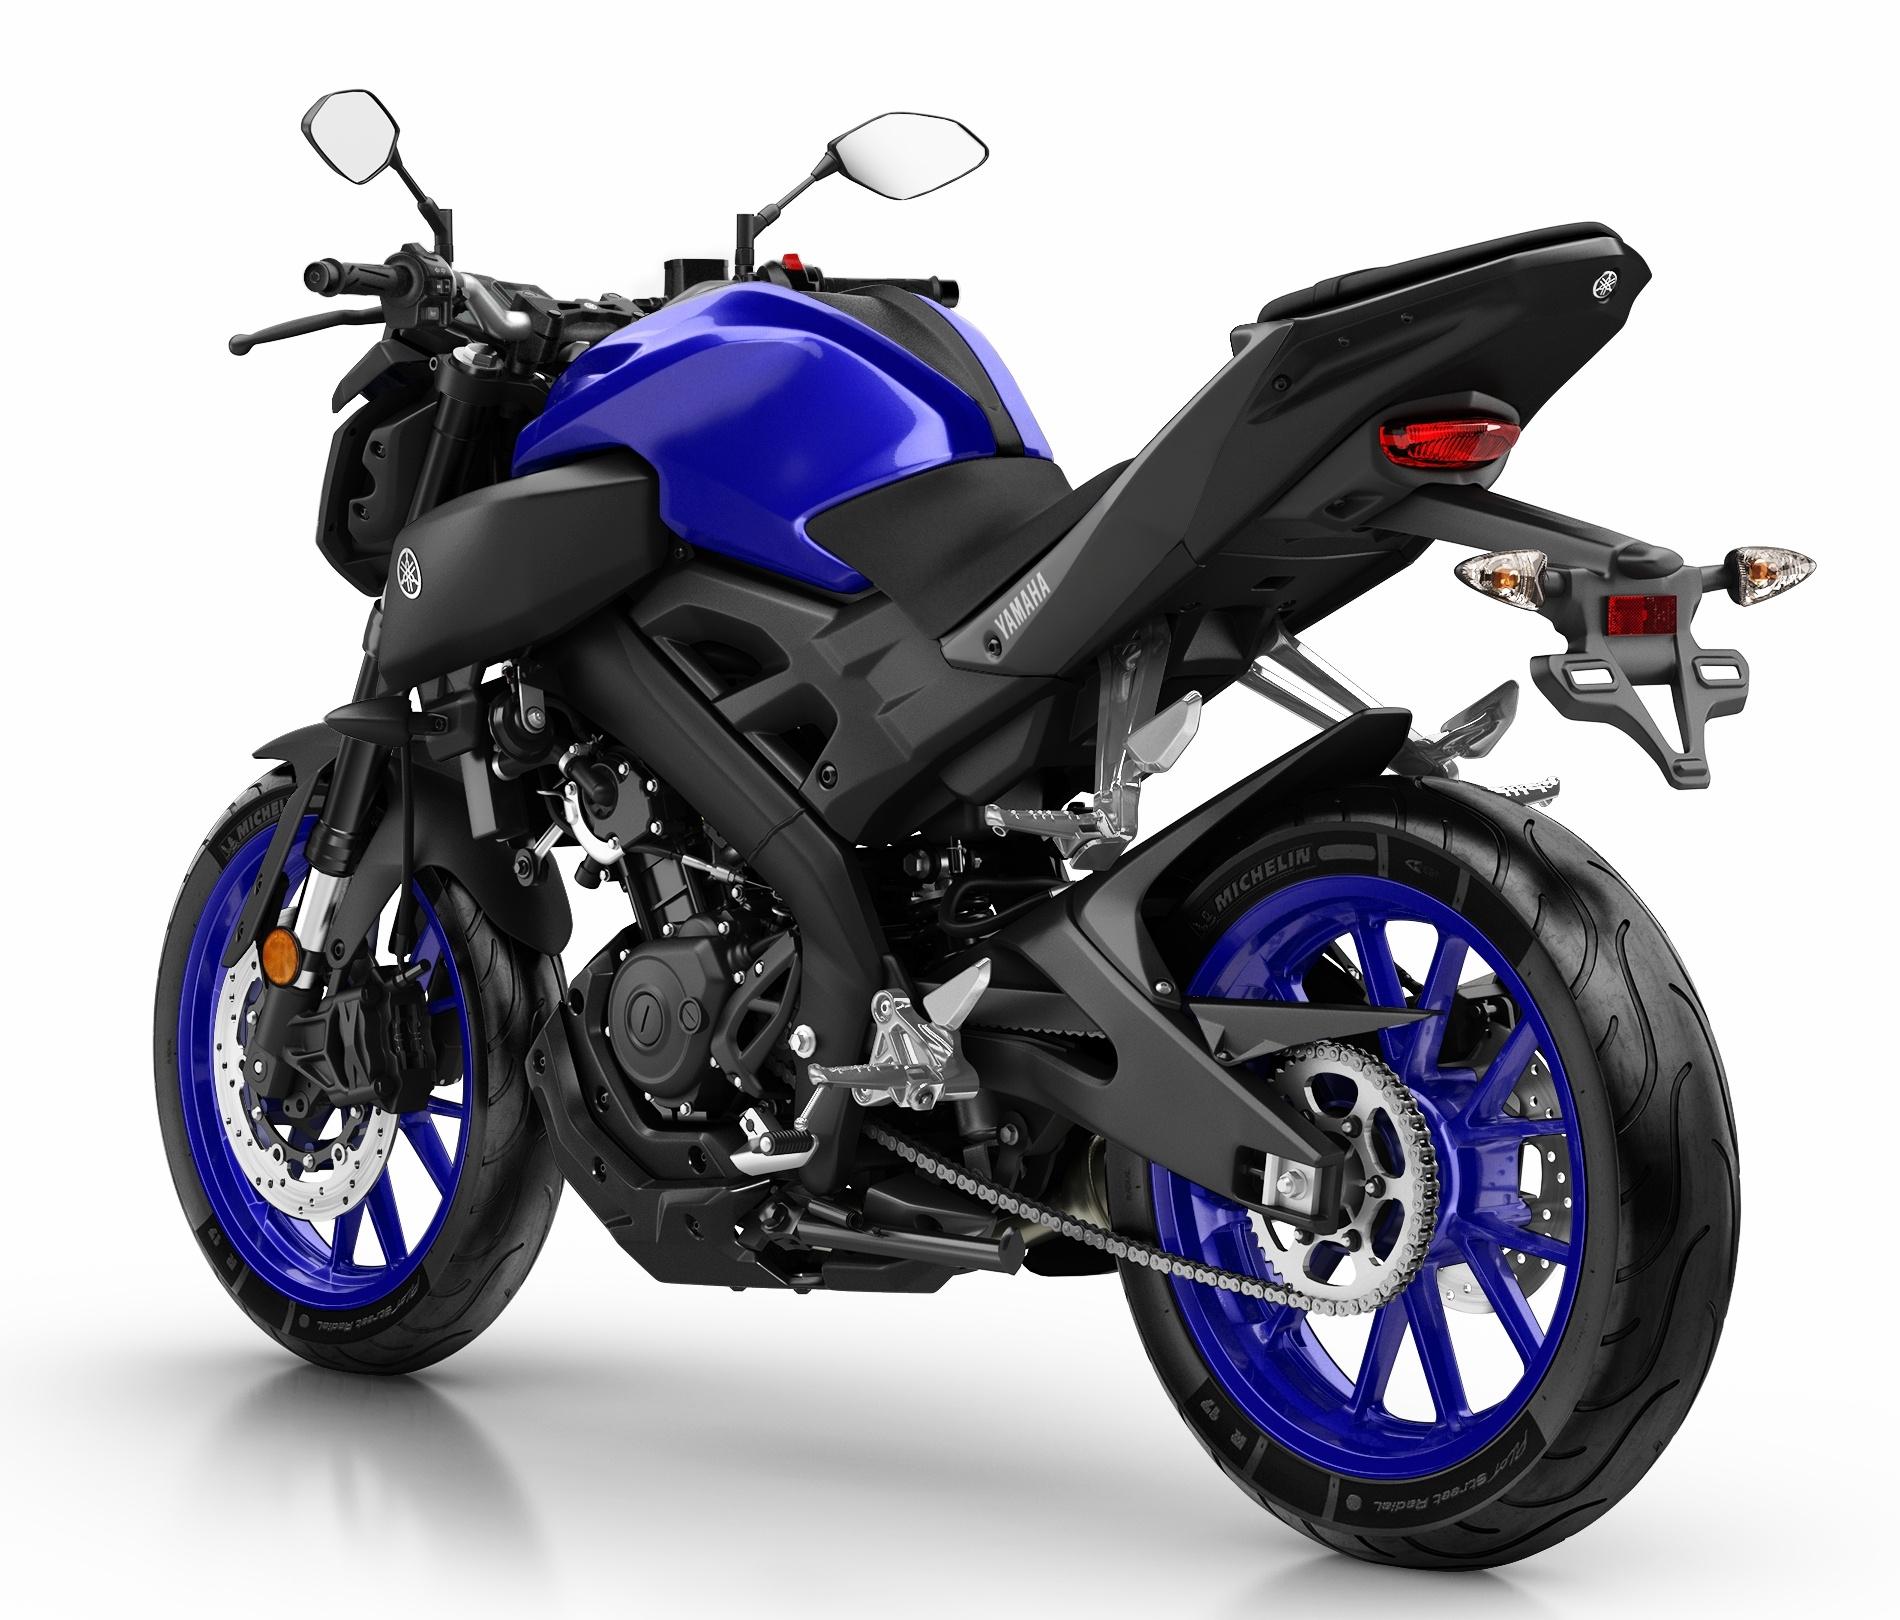 2017 yamaha motorcycles get new colour schemes image 556333. Black Bedroom Furniture Sets. Home Design Ideas